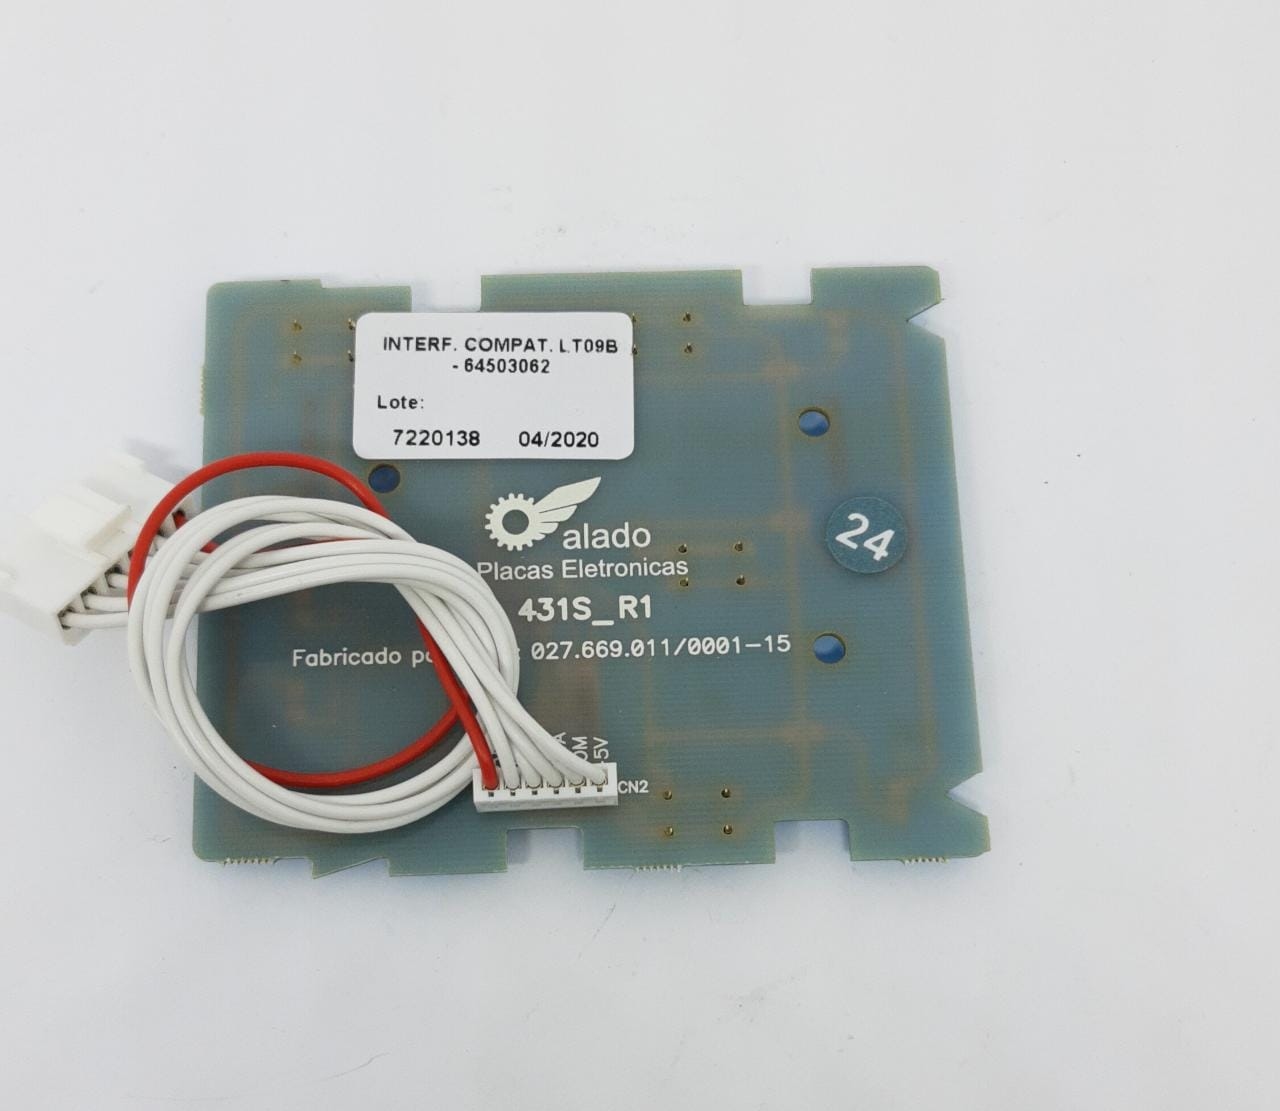 Placa Interface Electrolux Lt09b Lte08 64503062 - Alado